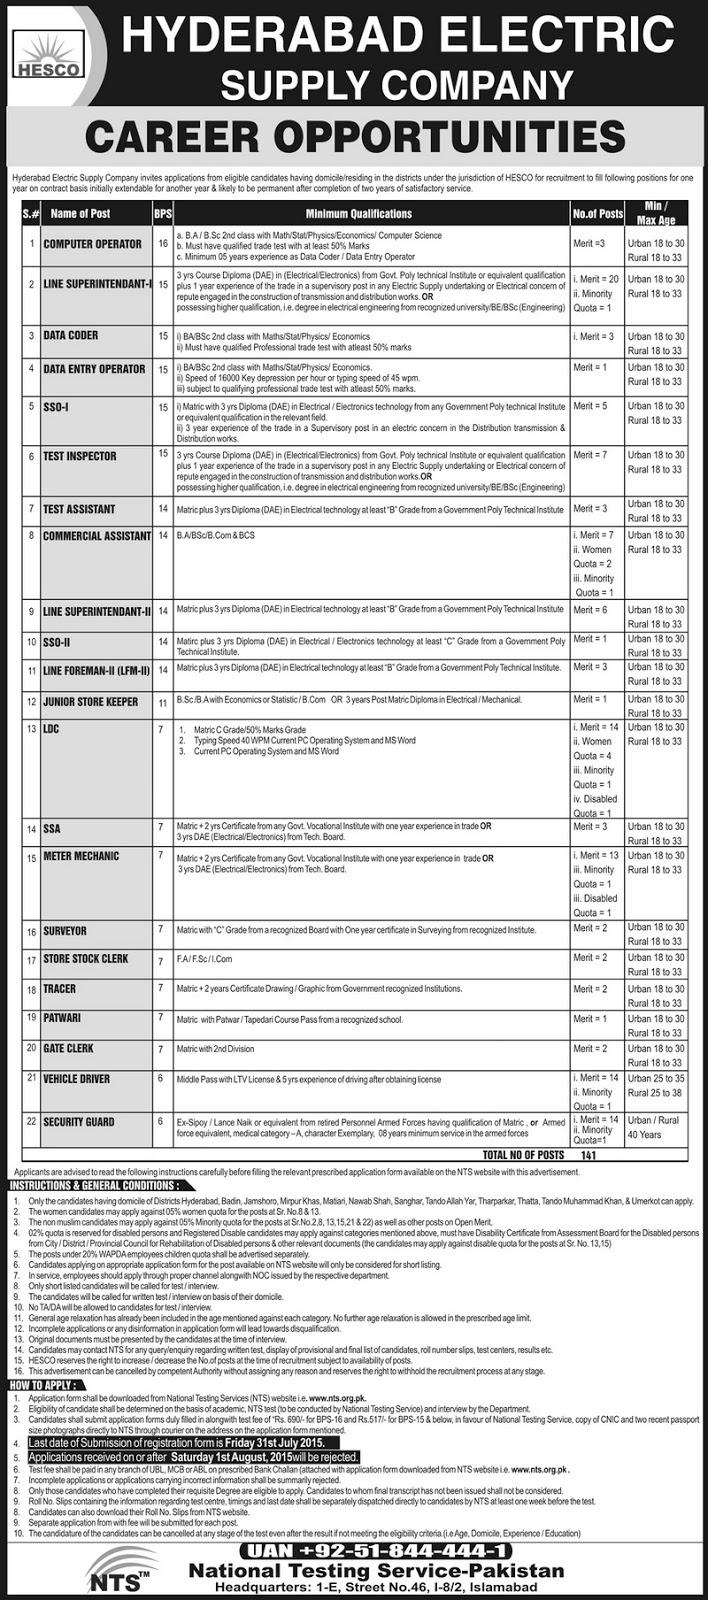 170+ New Govt Jobs in HESCO through NTS Jobs ~ Government Jobs